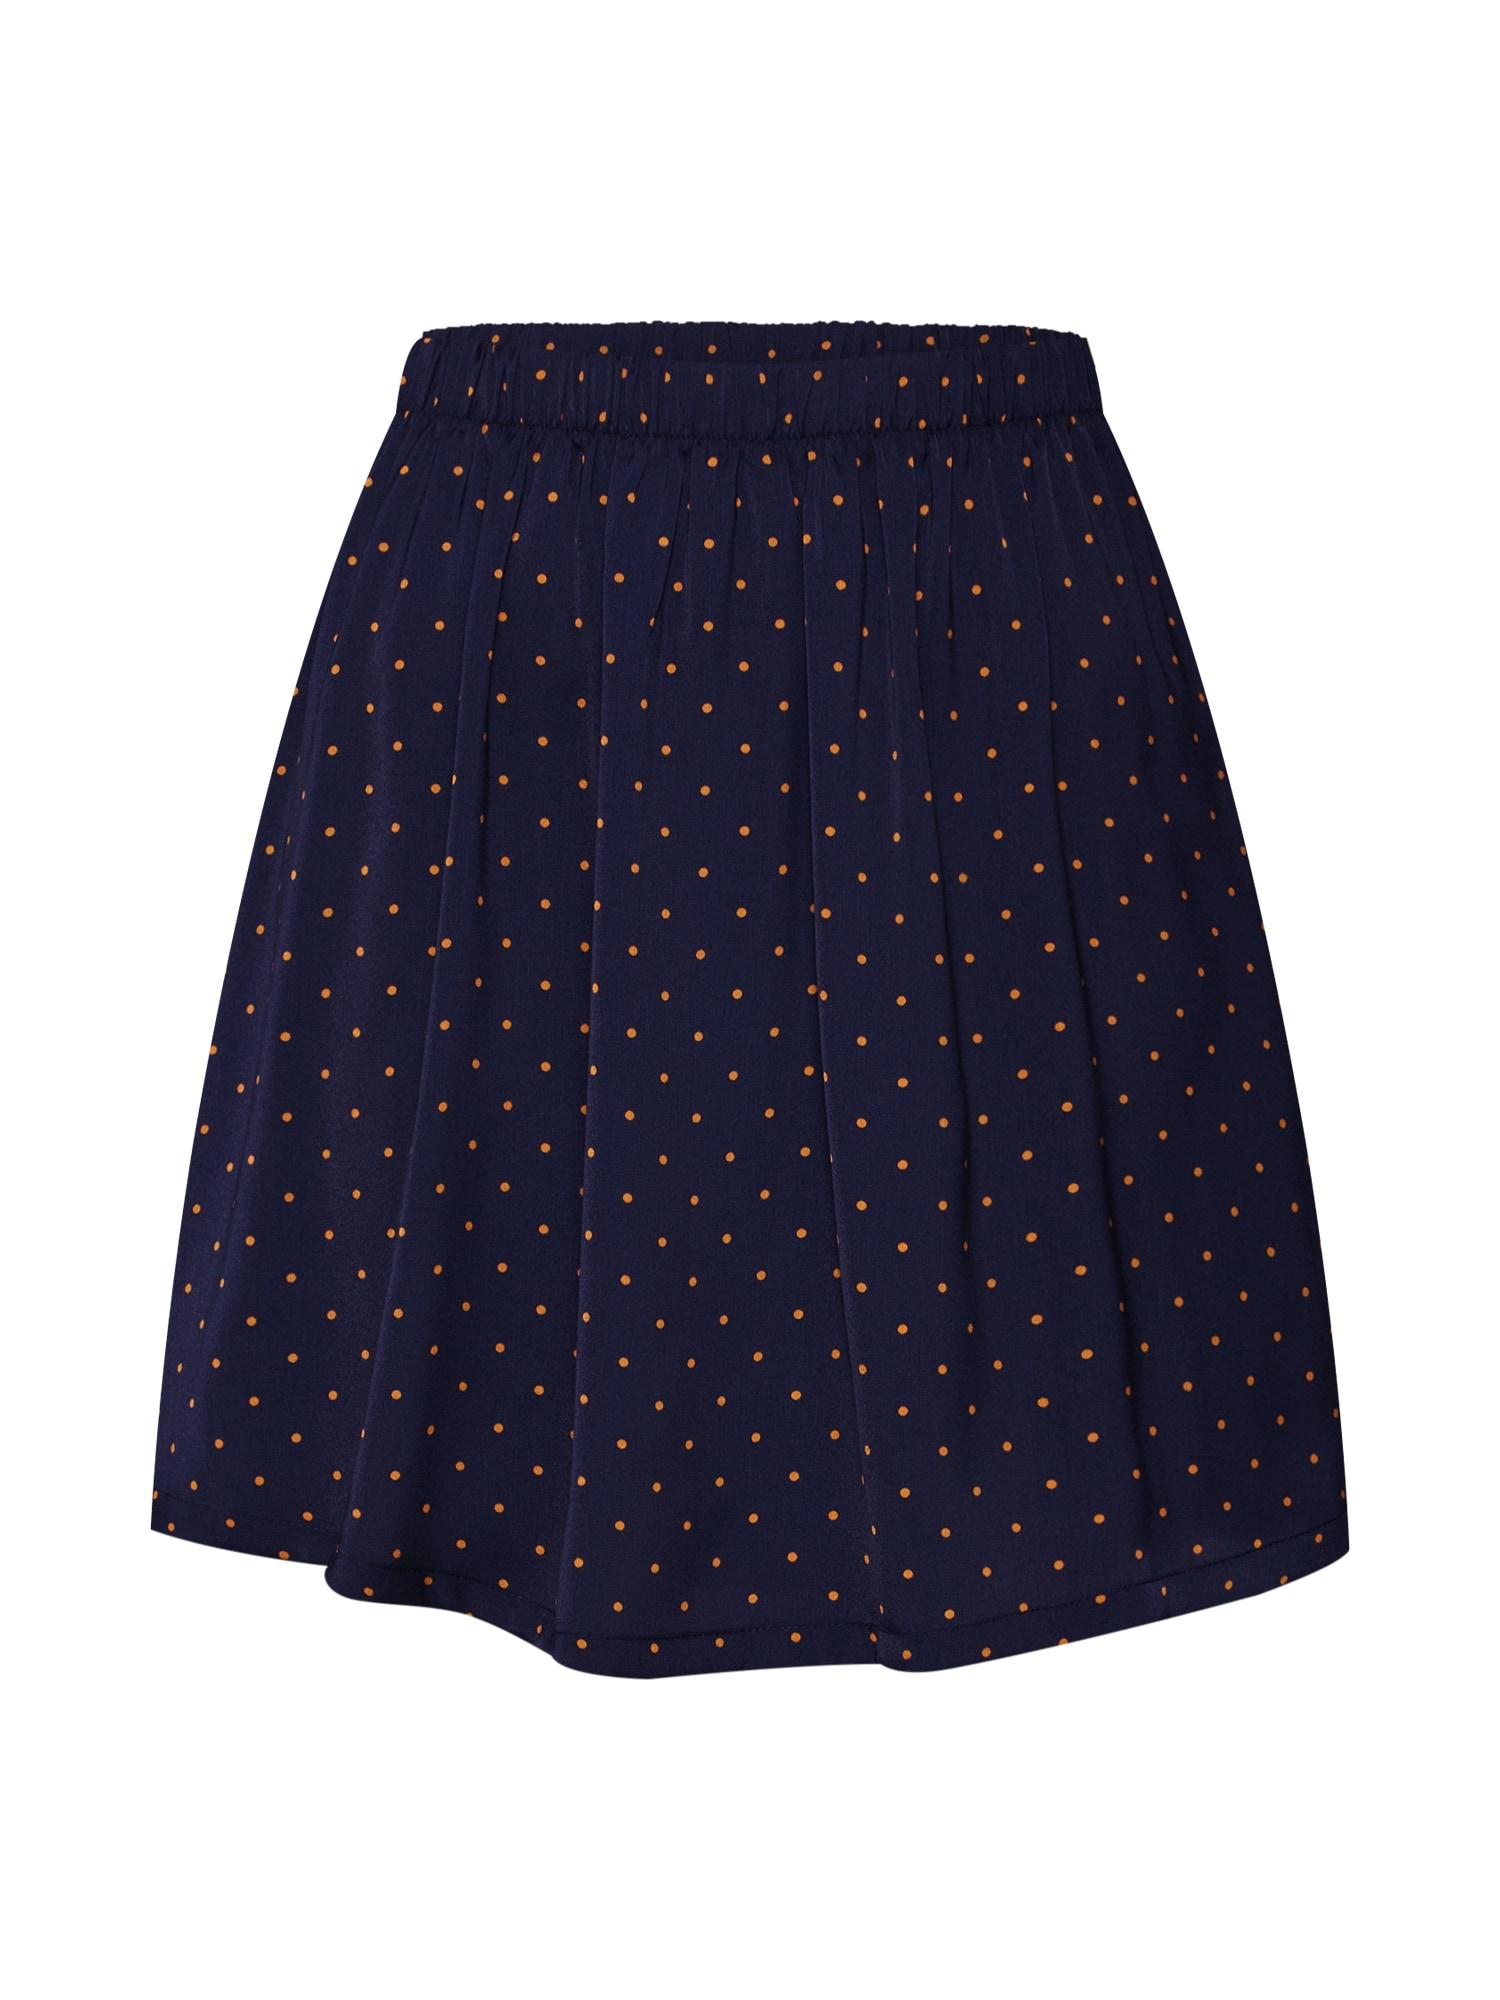 Rock 'Mille polysilk Skirt AOP' | Bekleidung > Röcke > Sonstige Röcke | Blau | moss copenhagen